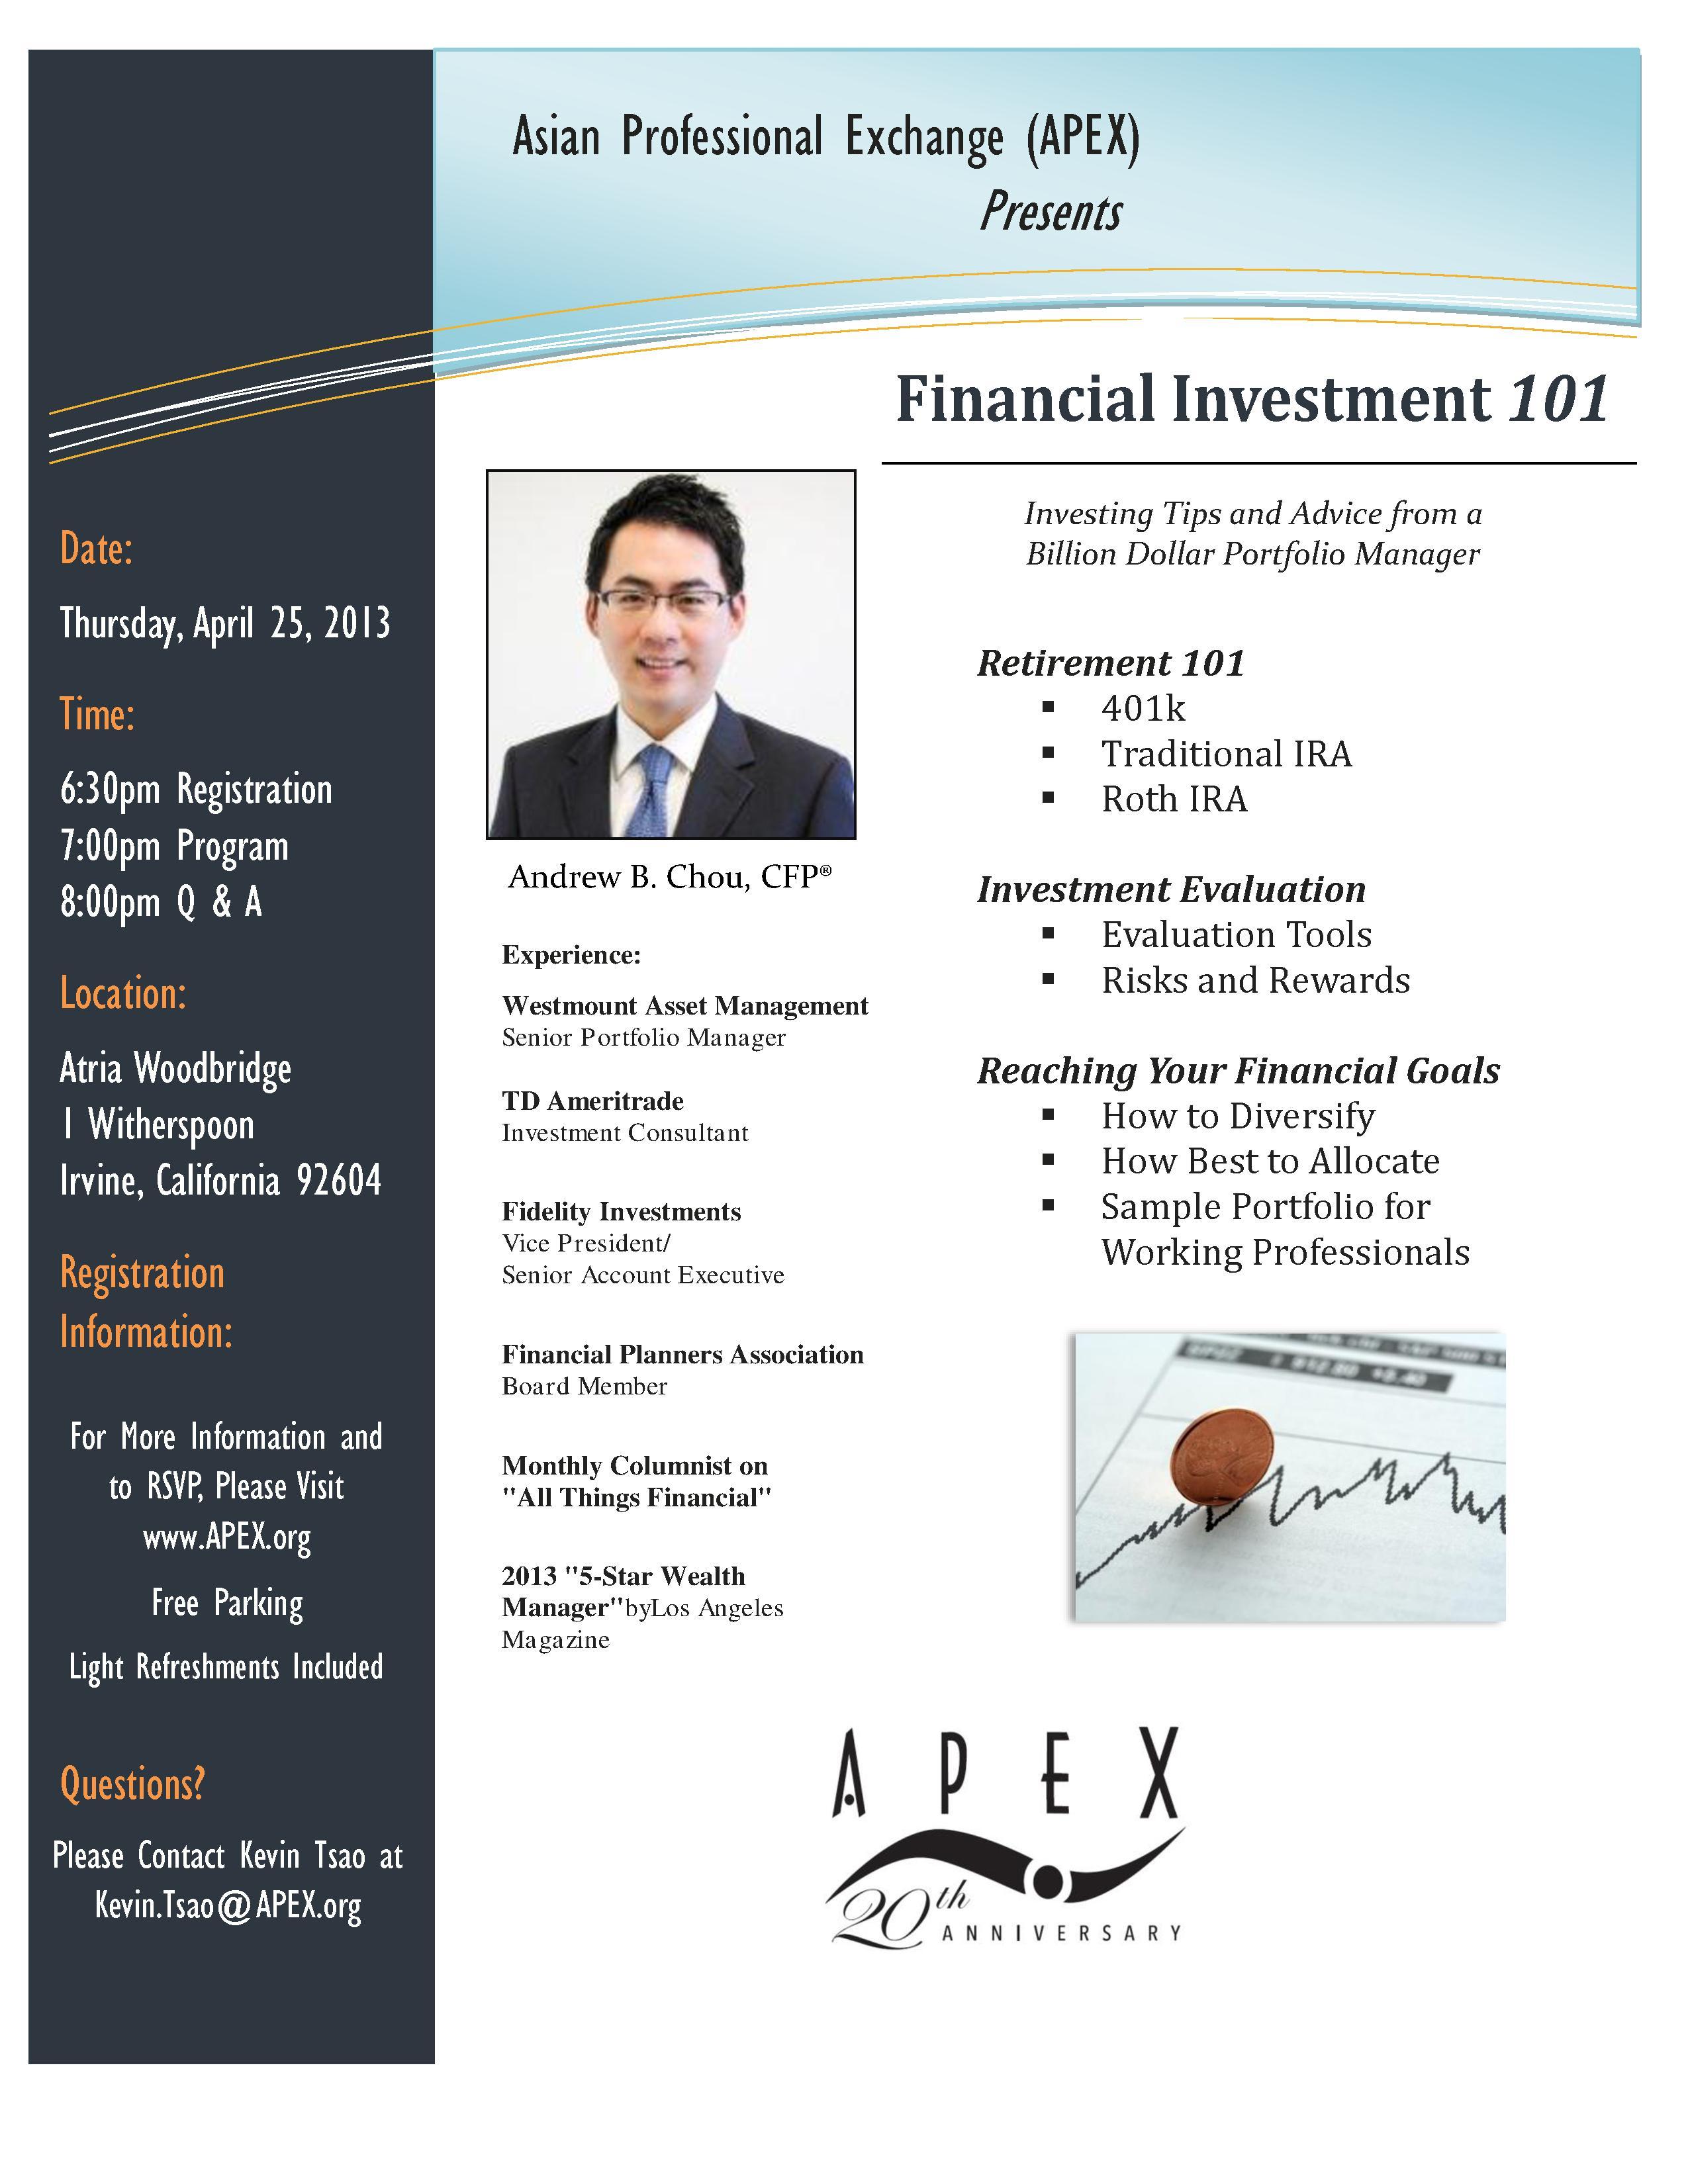 APEX Finance